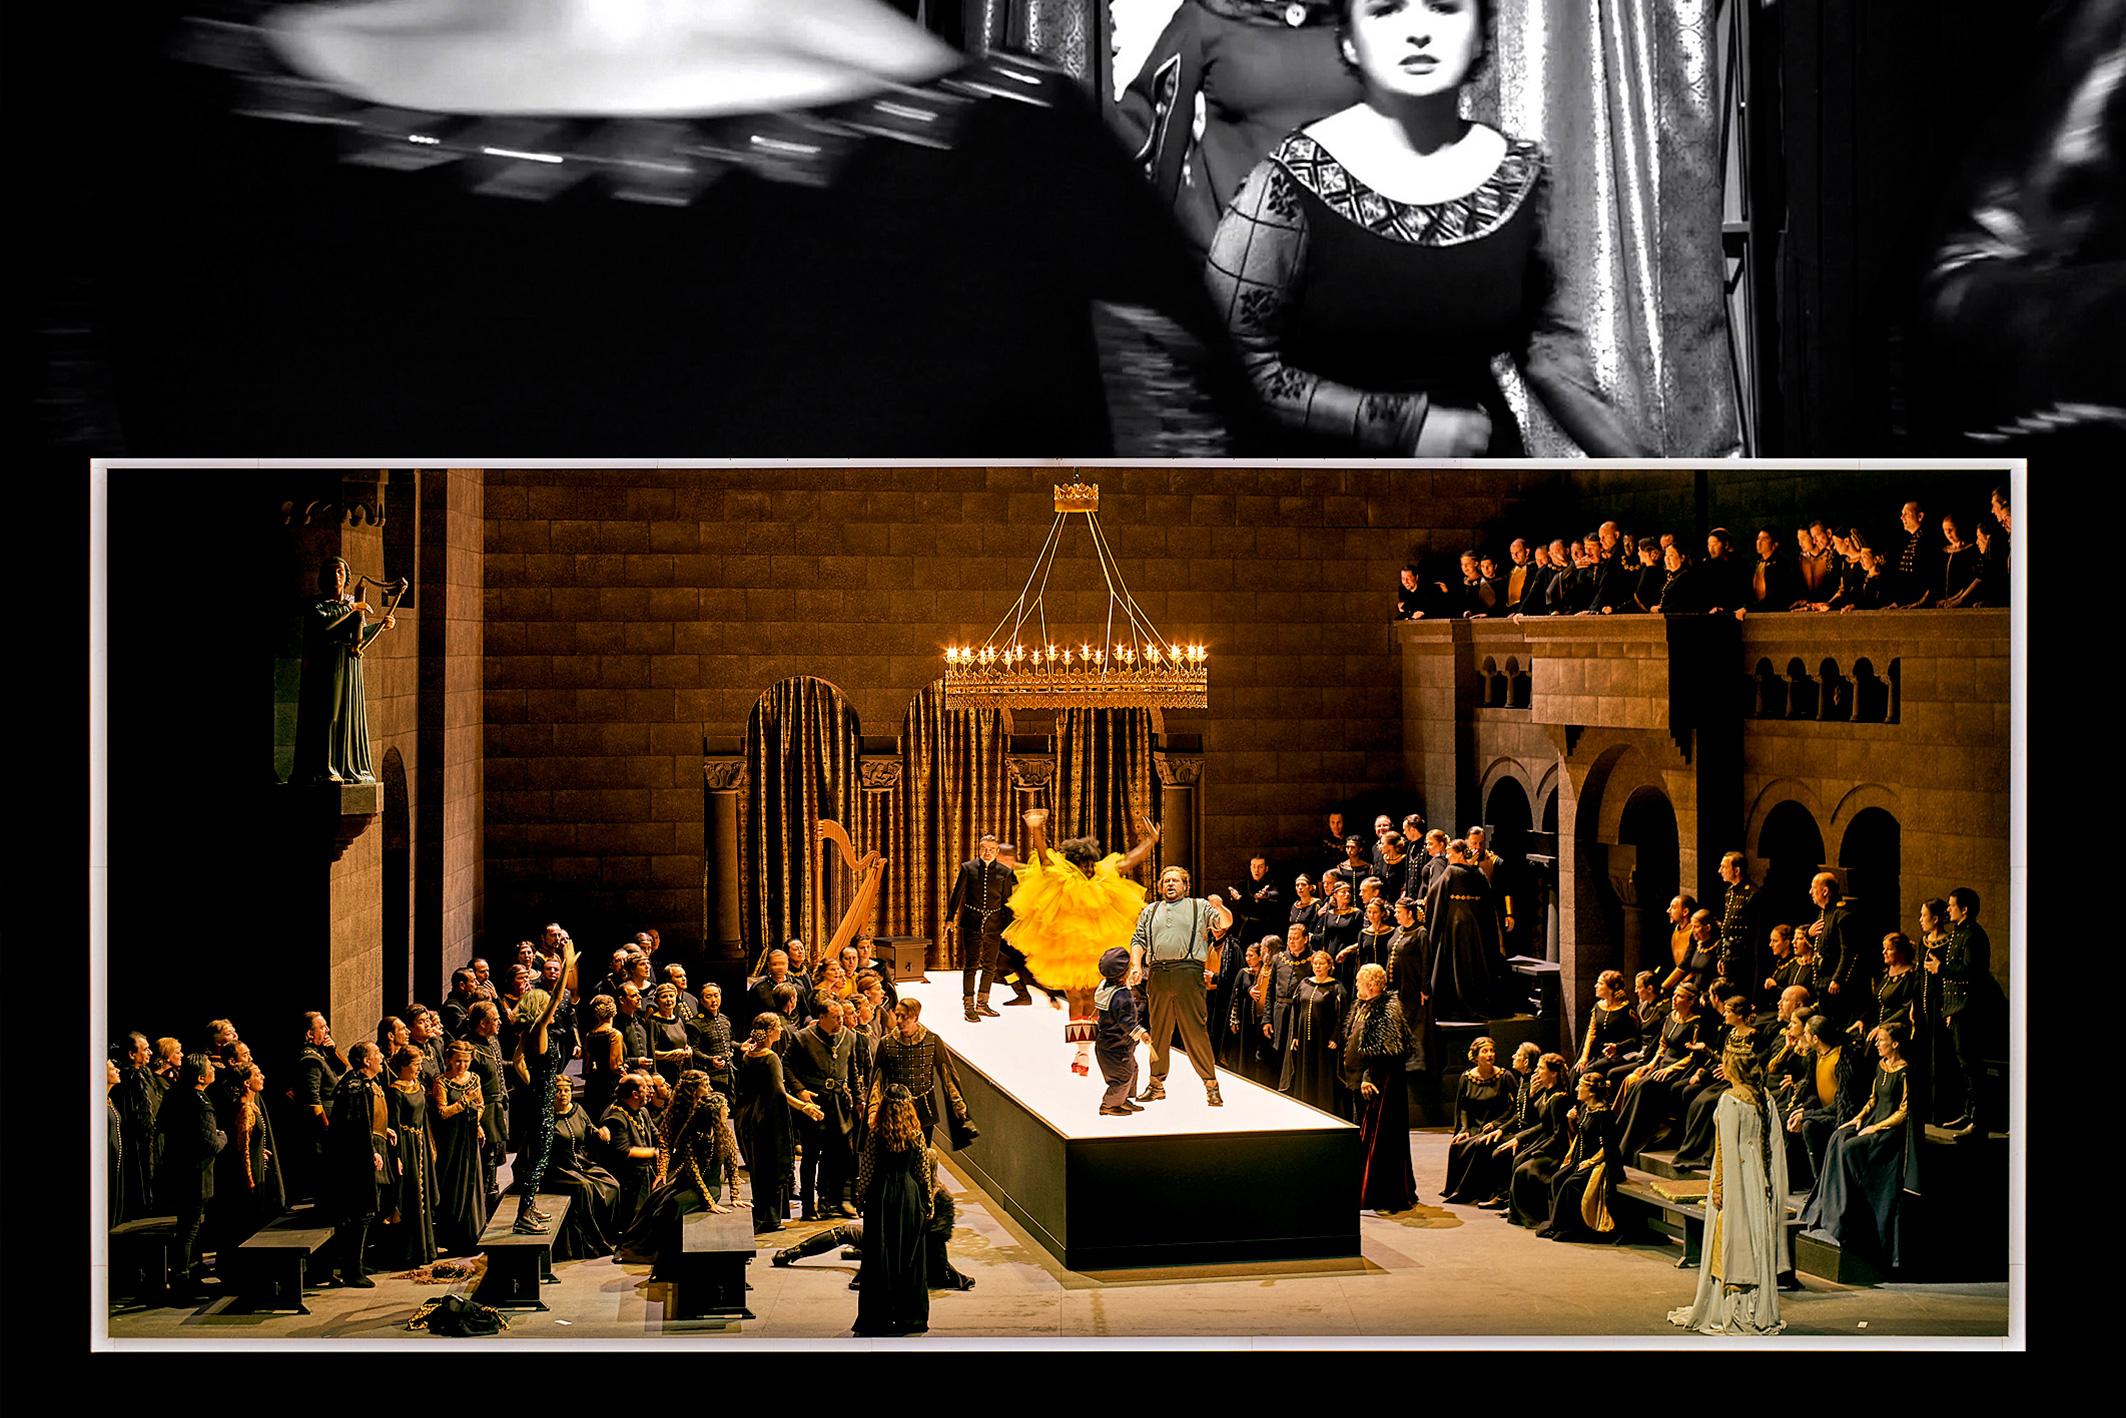 Tannhäuser   Bayreuther Festspiele 2019   Richard's Magazin